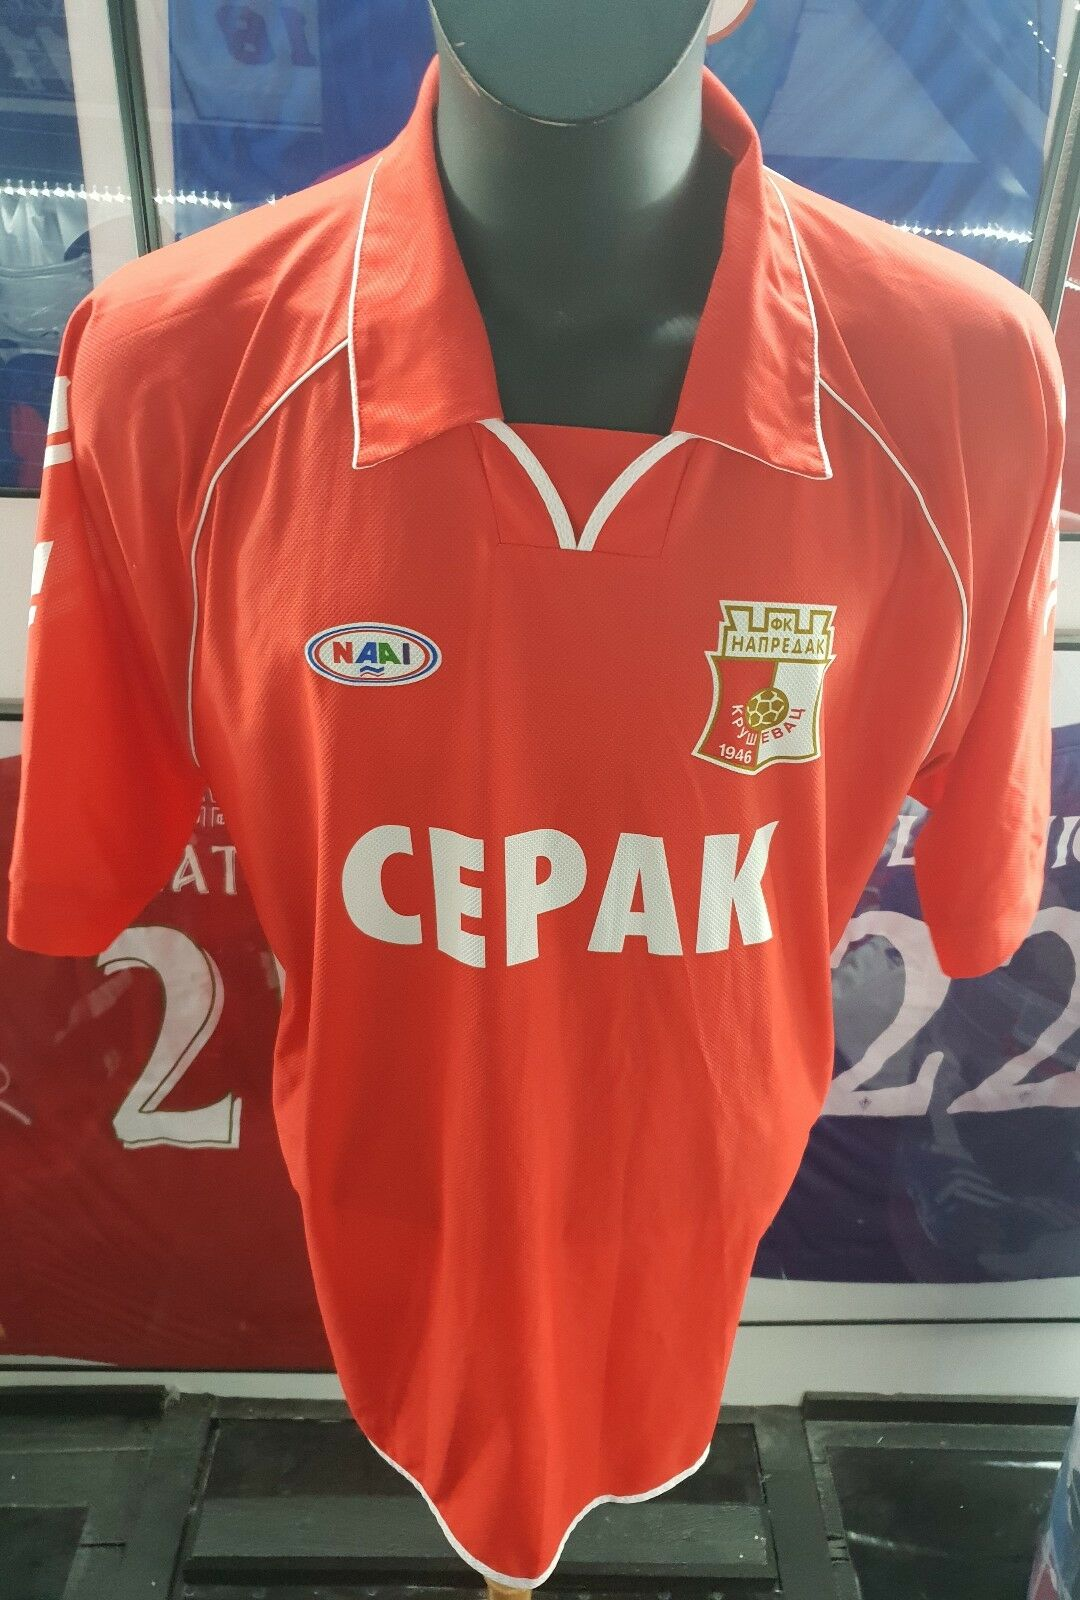 Maillot jersey spieler trikot shirt serbia napredak krusevac zvezda worn porté